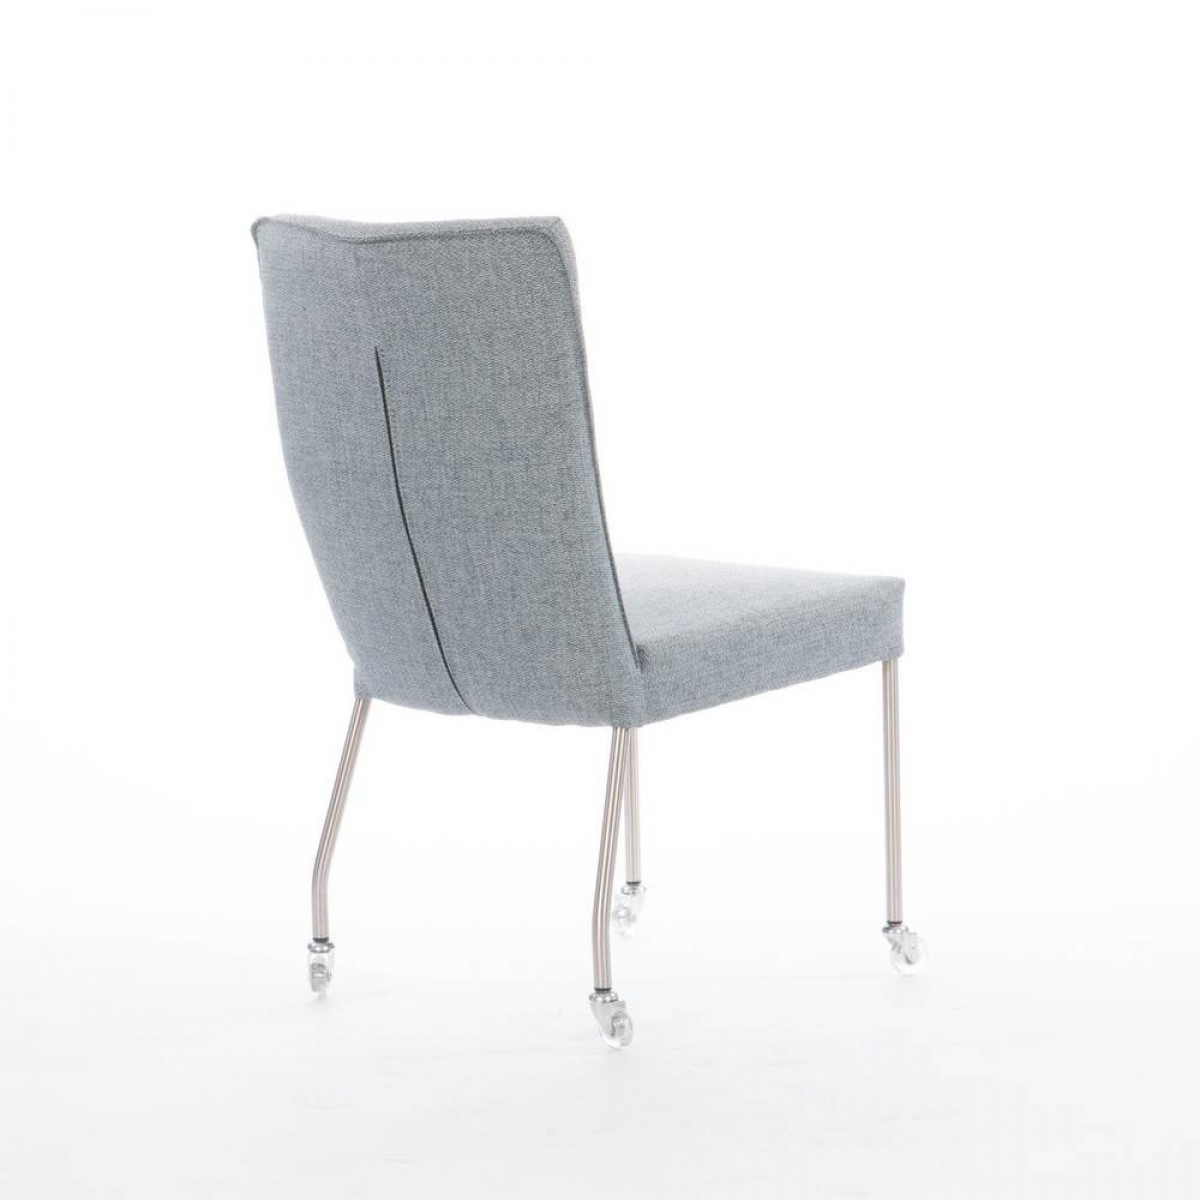 silver_stoel_stoel_eetkamerstoel_op_wielen_stof